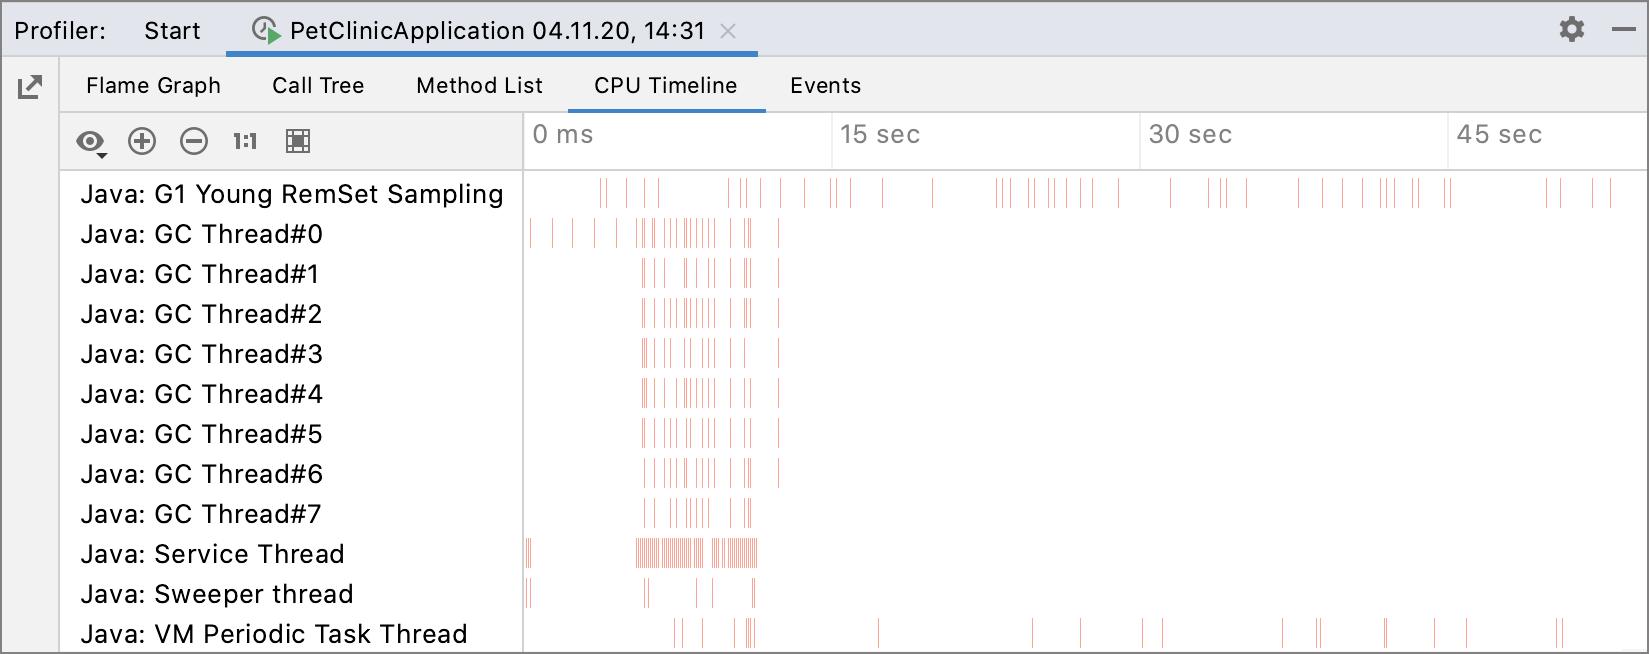 CPU timeline in the Profiler tool window